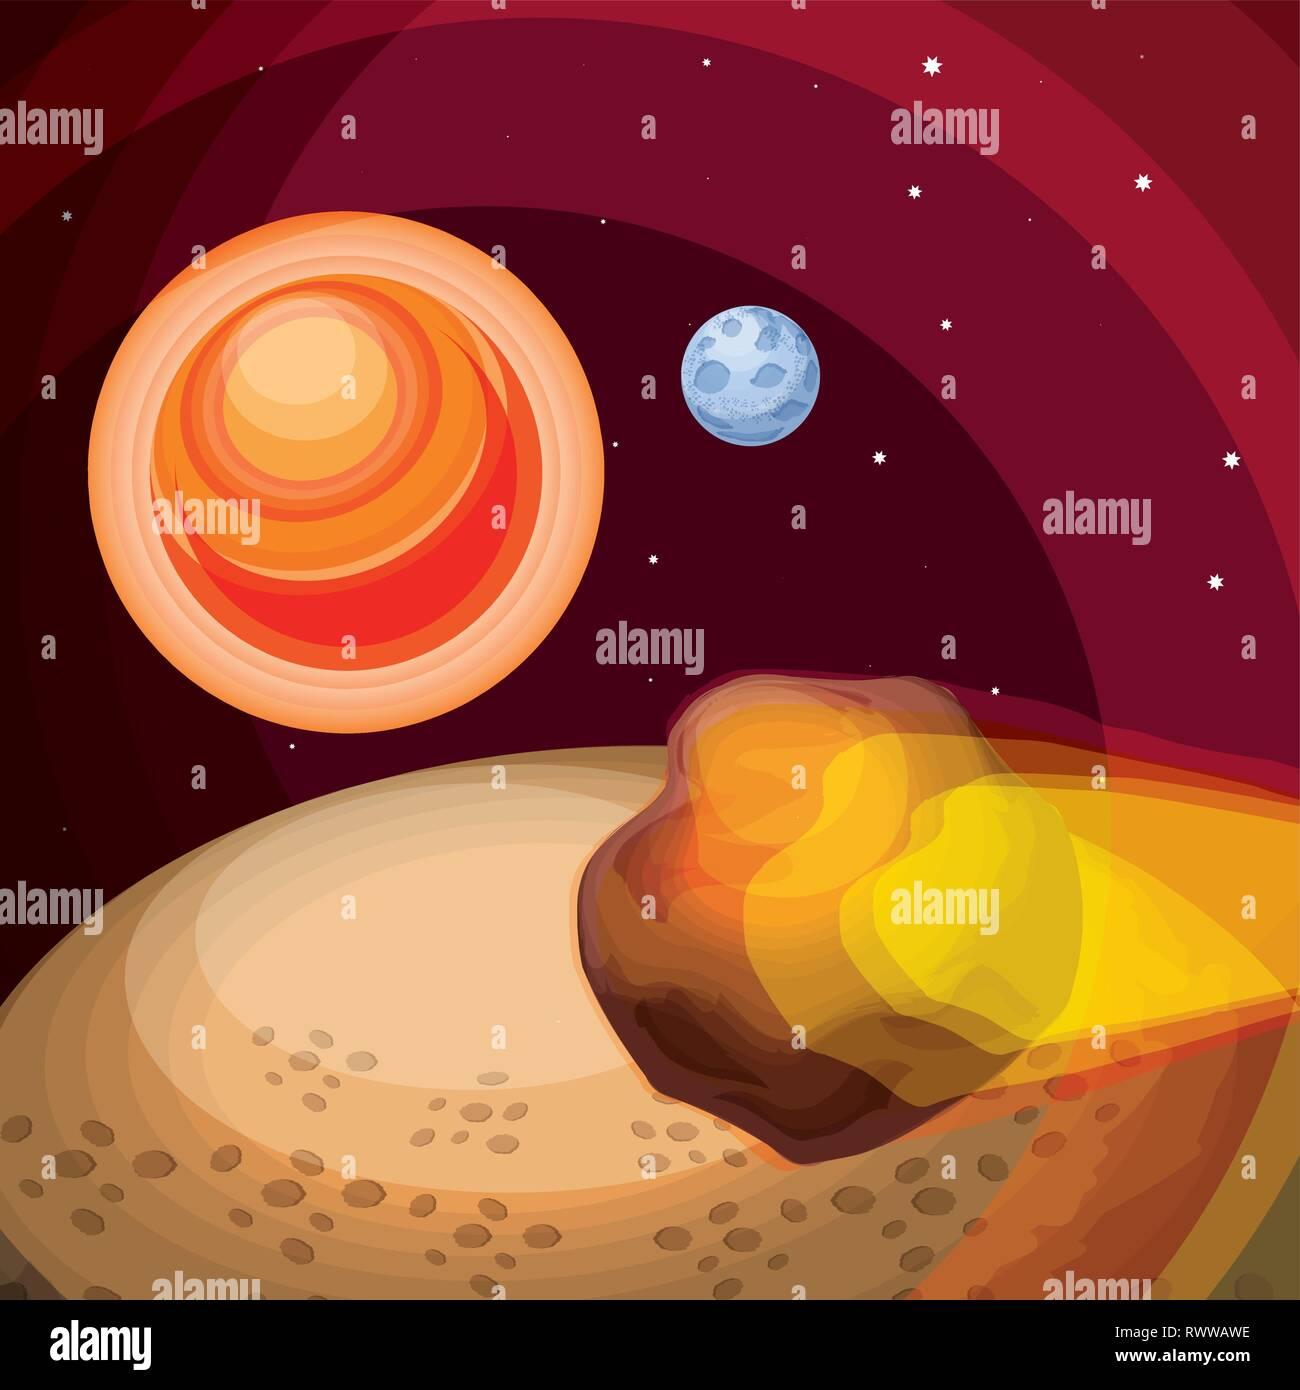 Asteroid Art Design